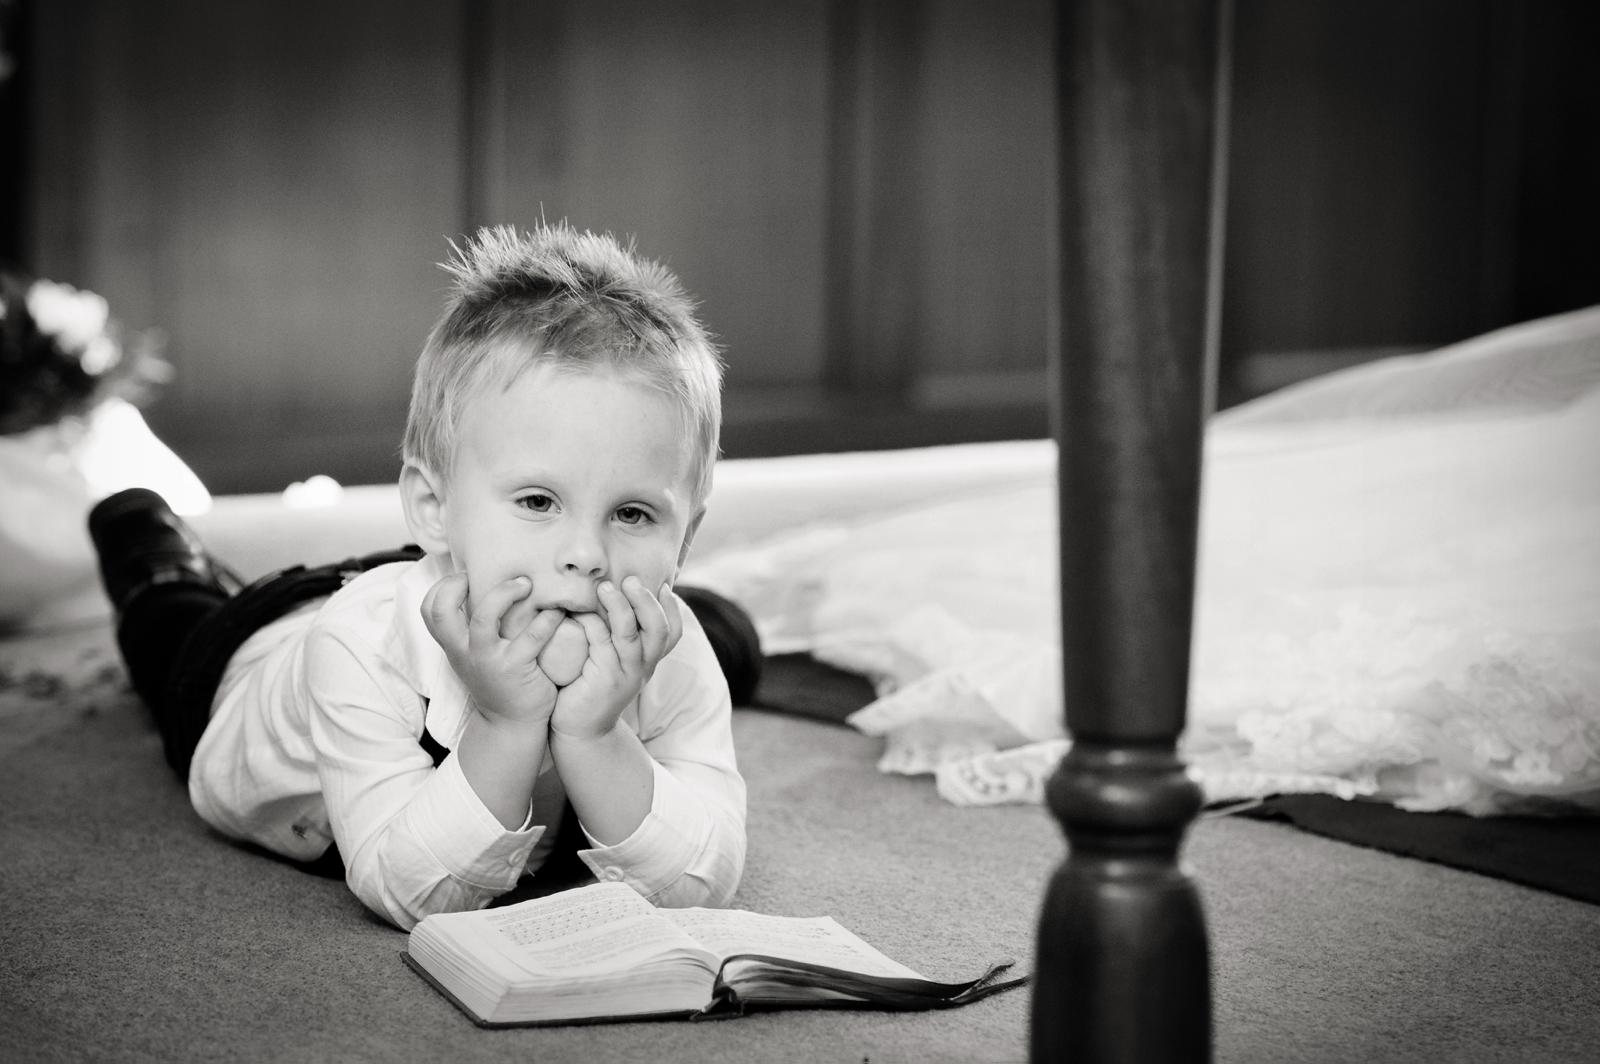 bored child in church